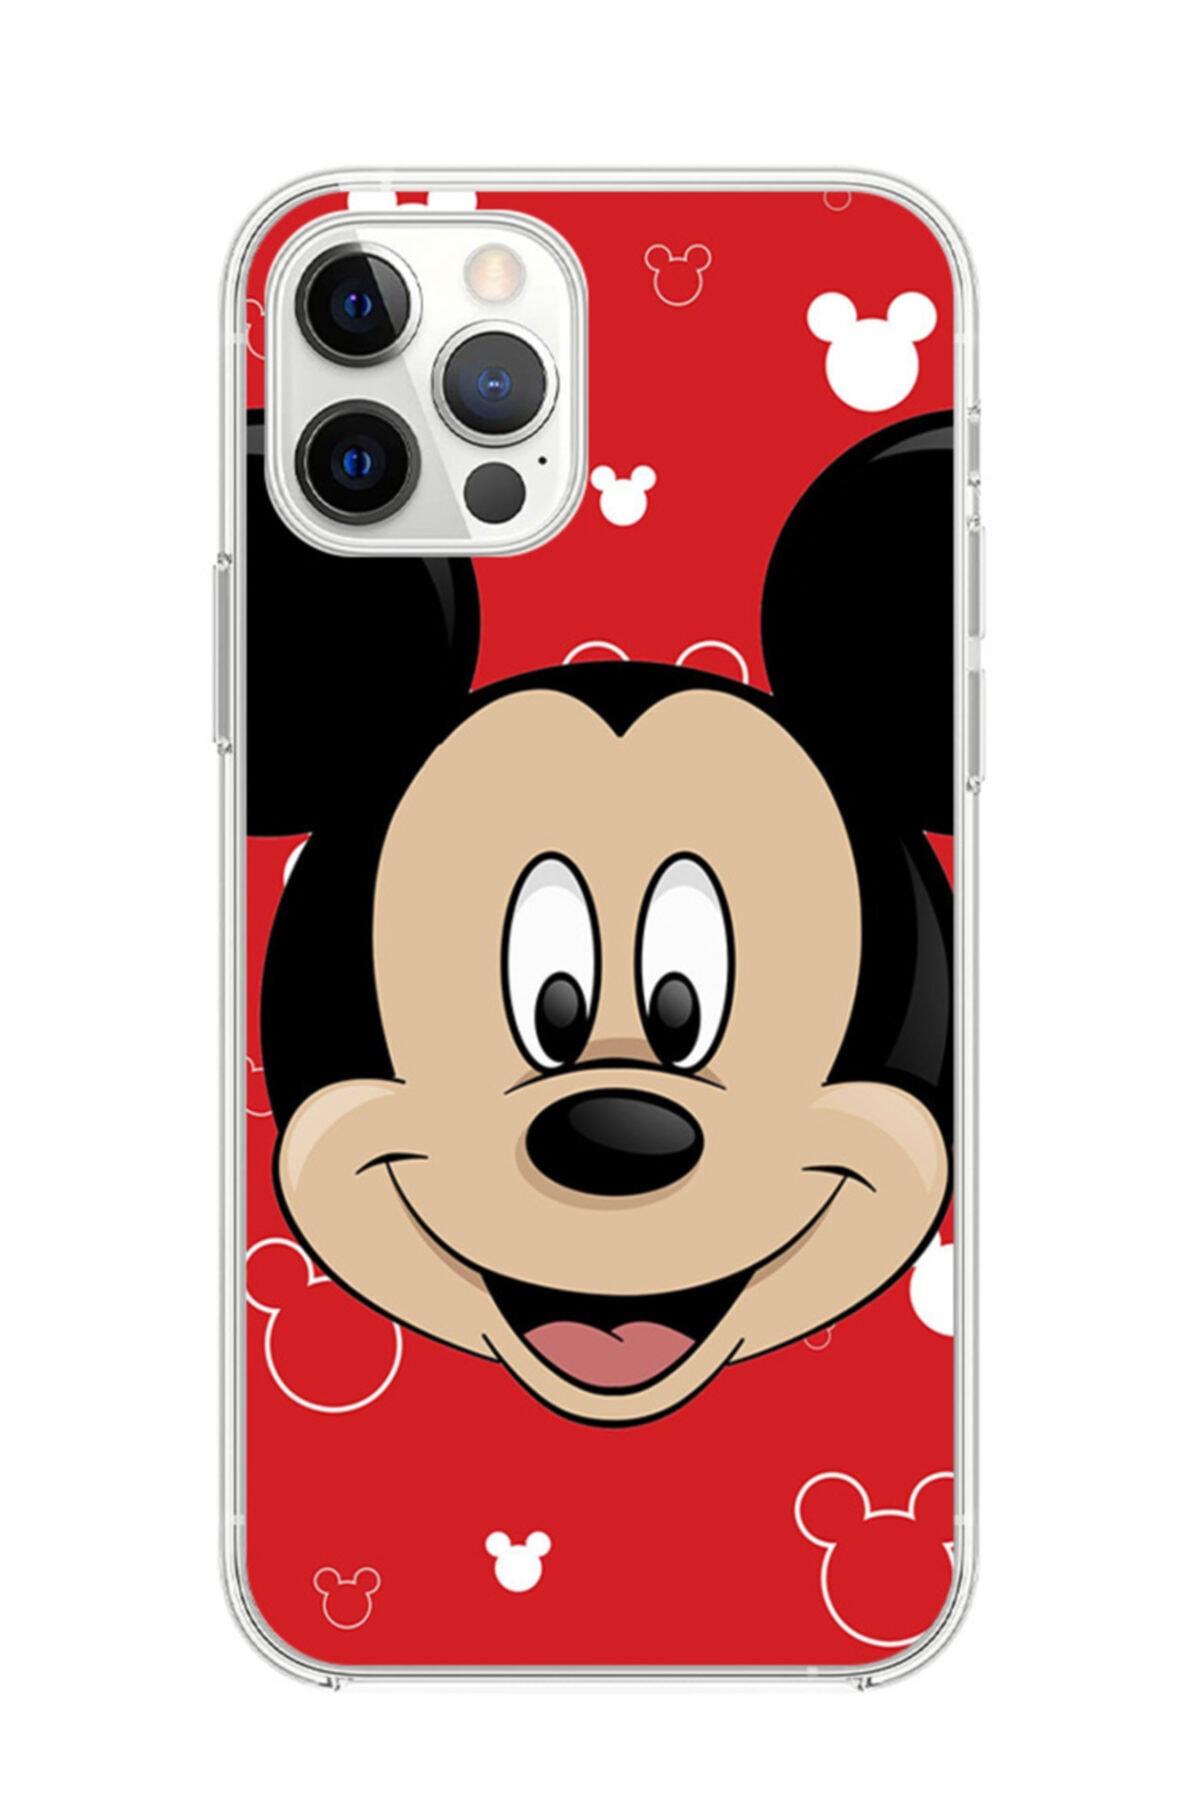 Dafhi Aksesuar Iphone 12 Pro Max Mickey Mouse Telefon Kılıfı 1